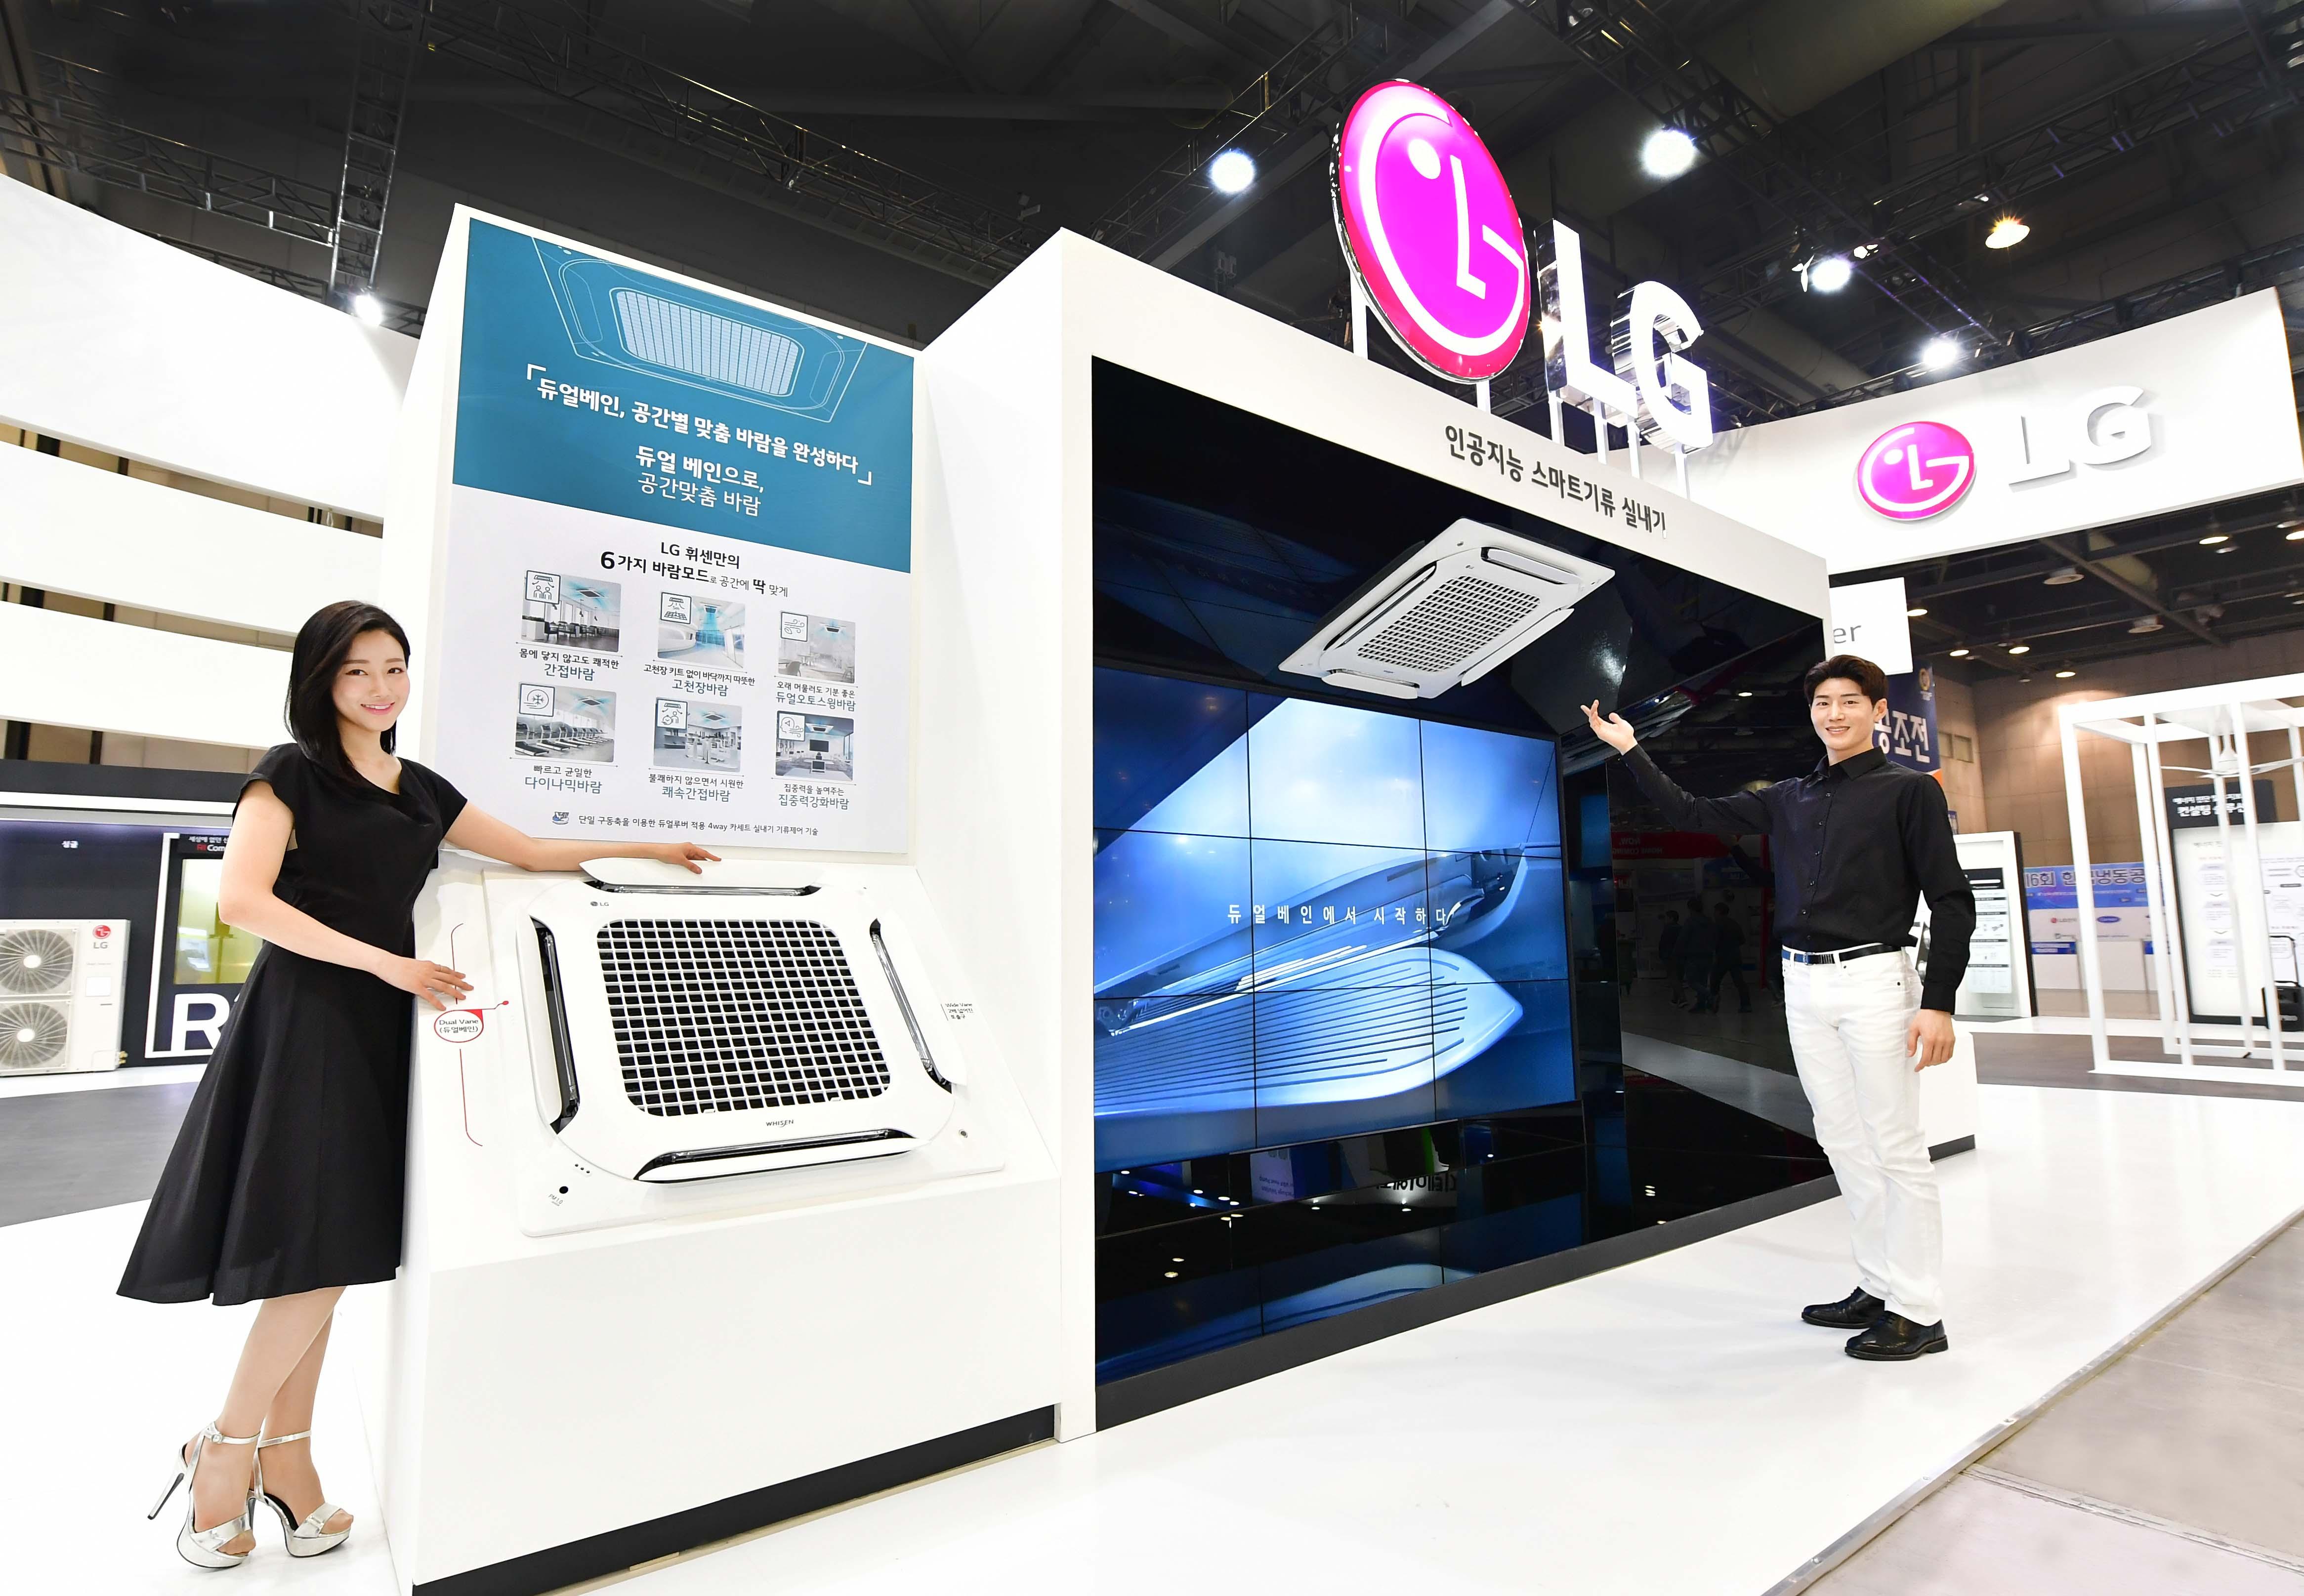 : LG전자가 12일부터 15일까지 일산 킨텍스에서 열리는 한국국제냉난방공조전 '하프코 2019(HARFKO; Heating, Air-Conditioning, Refrigeration and Fluid Exhibition KOREA 2019)'에 참가해 공간 맞춤형 종합 공조 제품을 대거 선보였다. 사진은 듀얼베인을 적용한 인공지능 스마트기류 실내기를 소개하는 모습